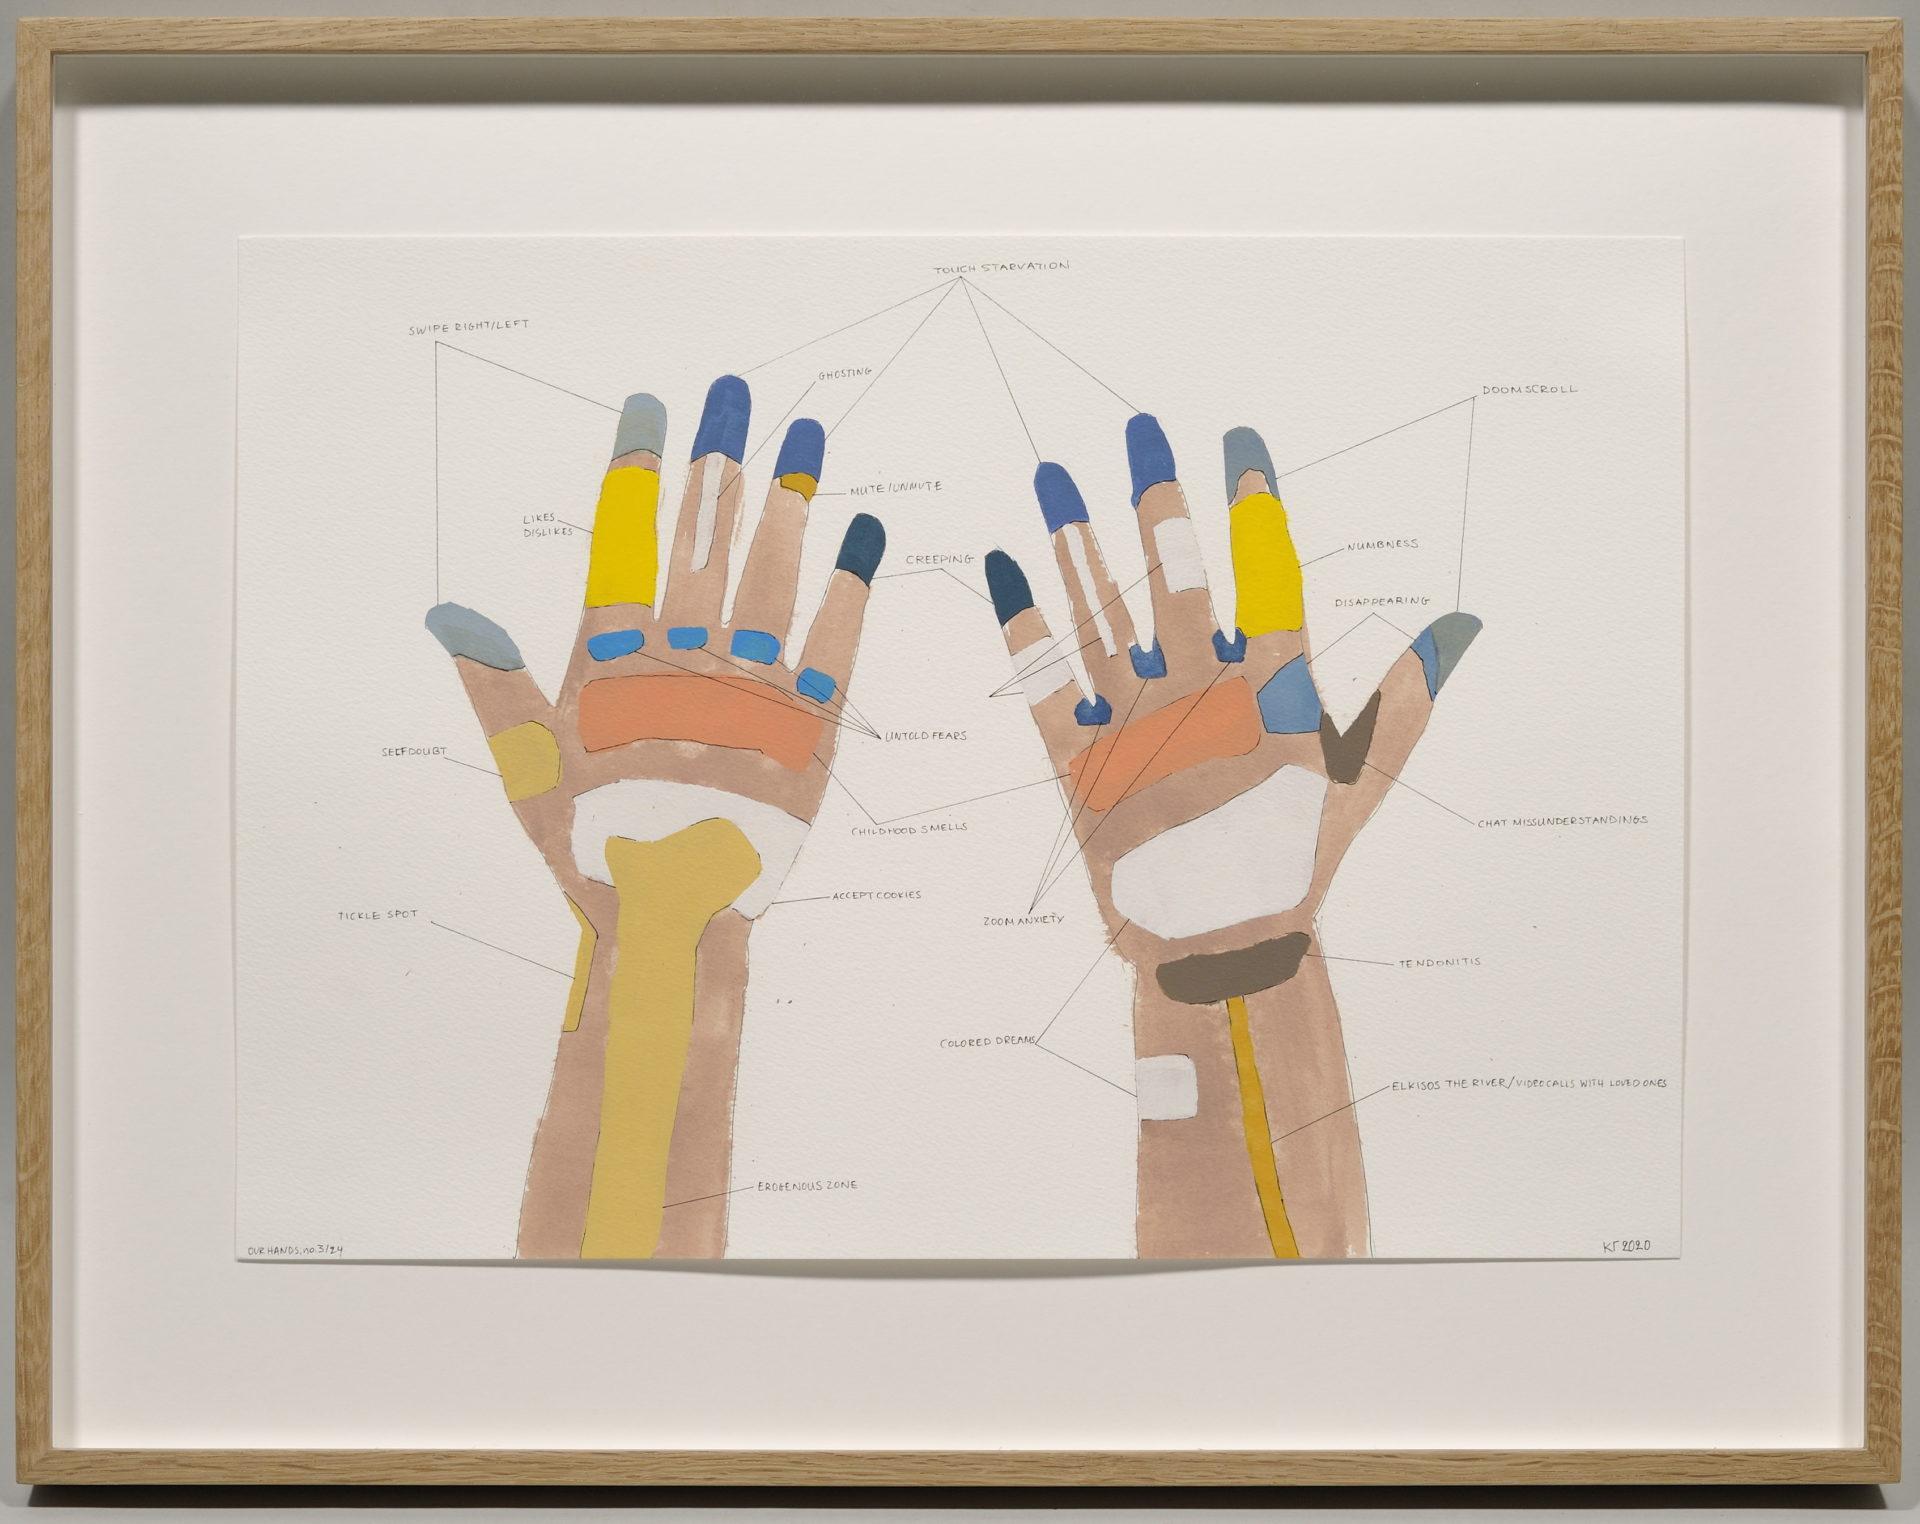 Our Hands No3 Kyriaki Goni framed Hans G Scheib